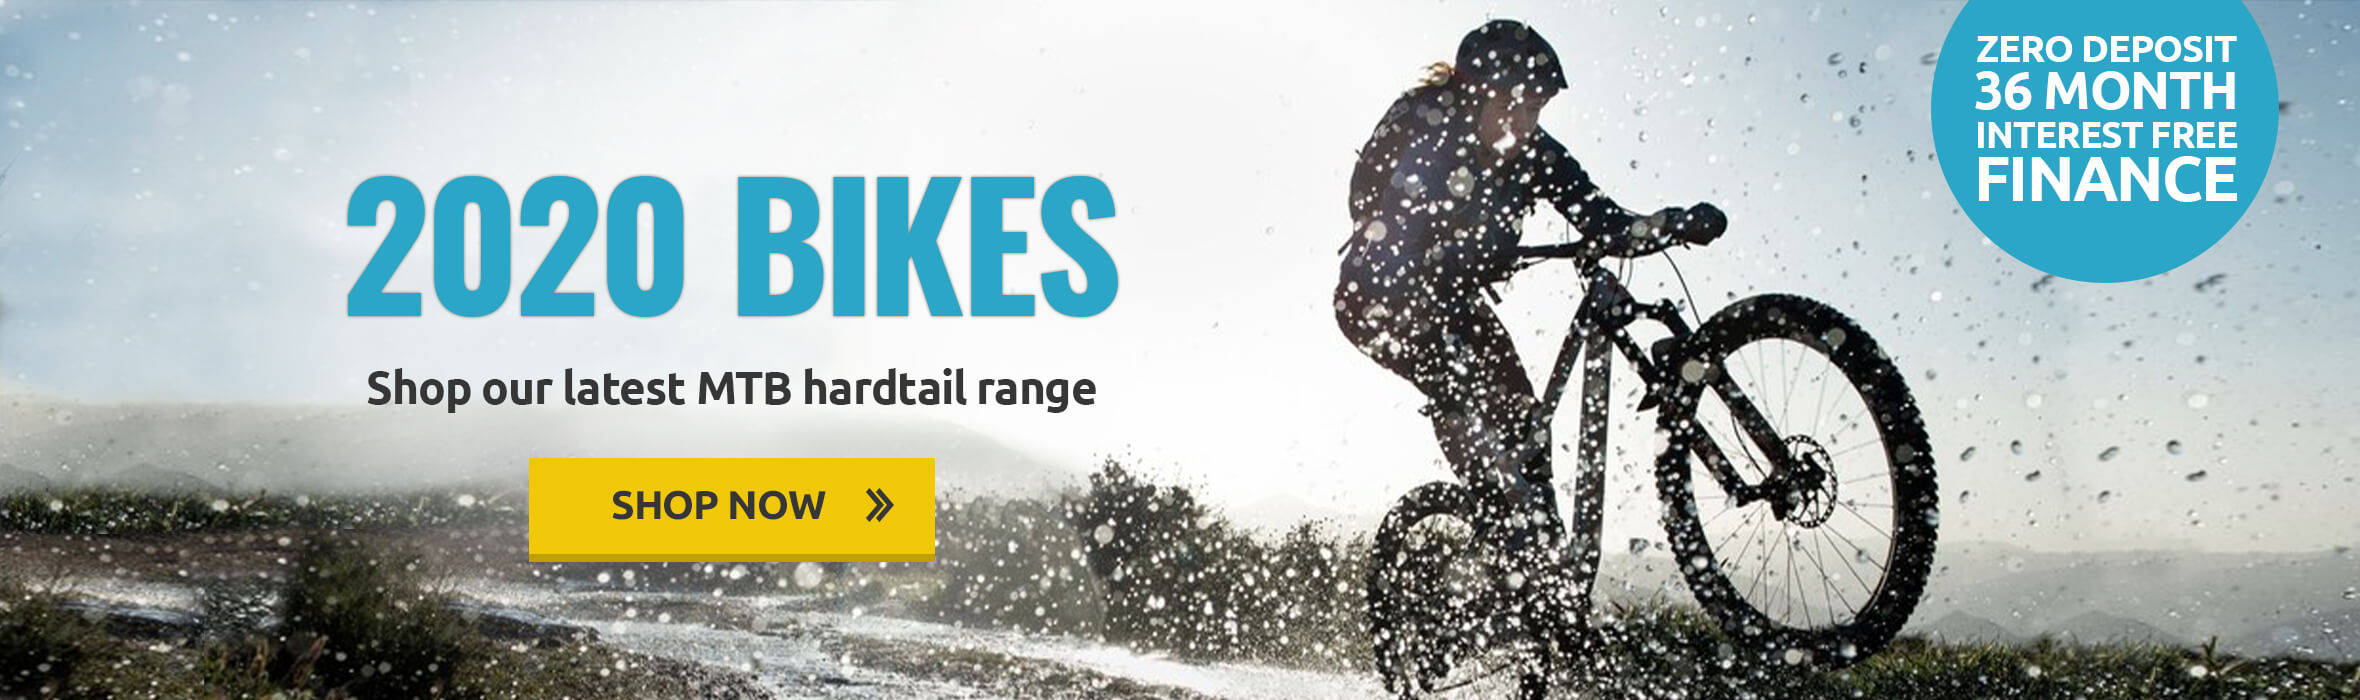 2020 MTB Hardtail Bike Range - Zero Deposit Interest Free Finance Available